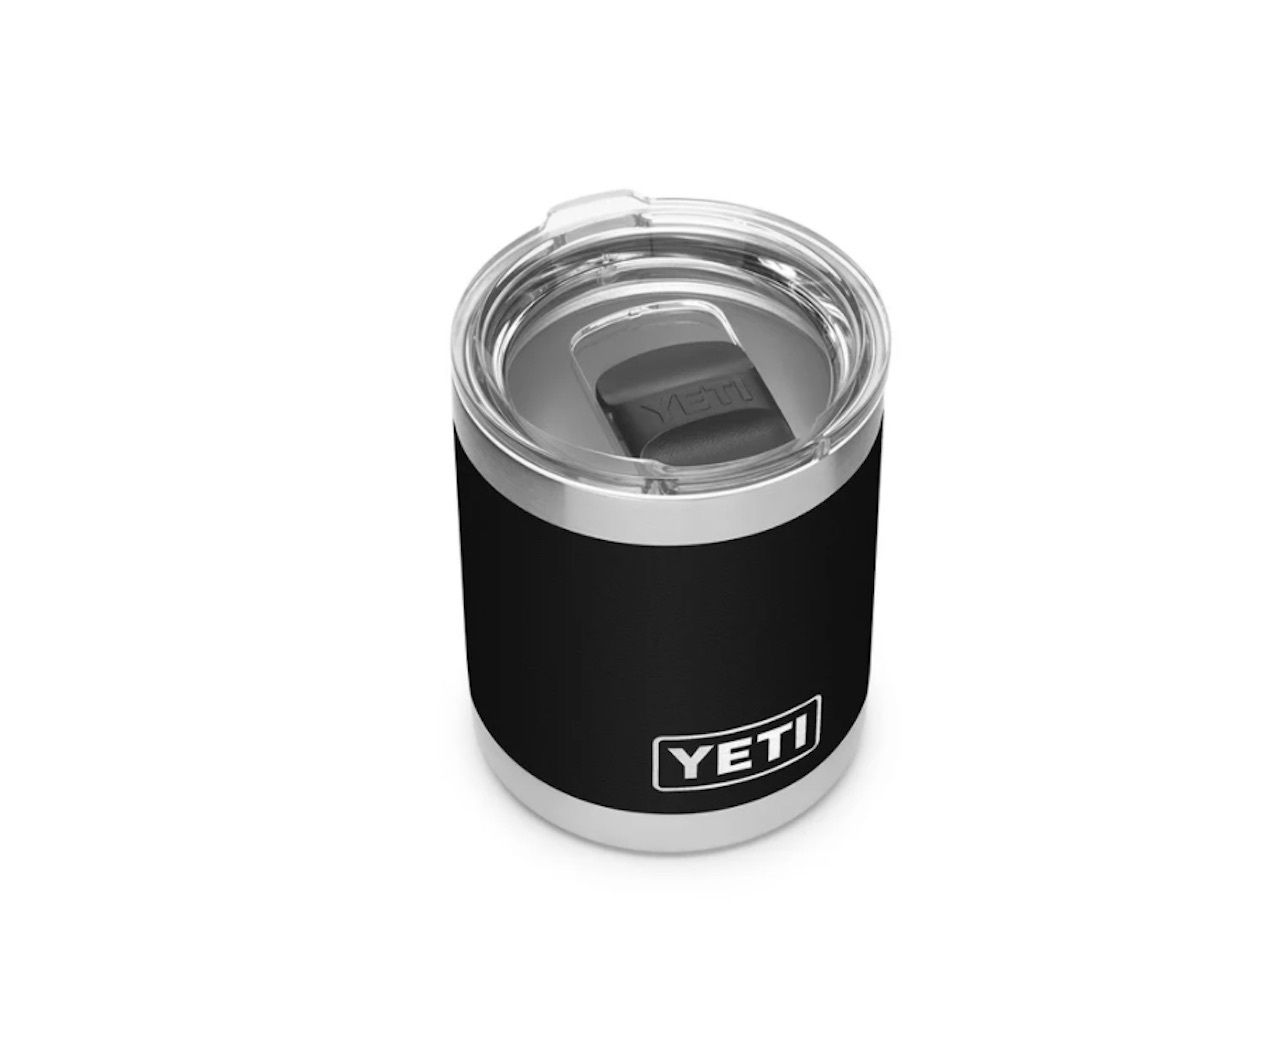 yeti-fall-collection-tumbler